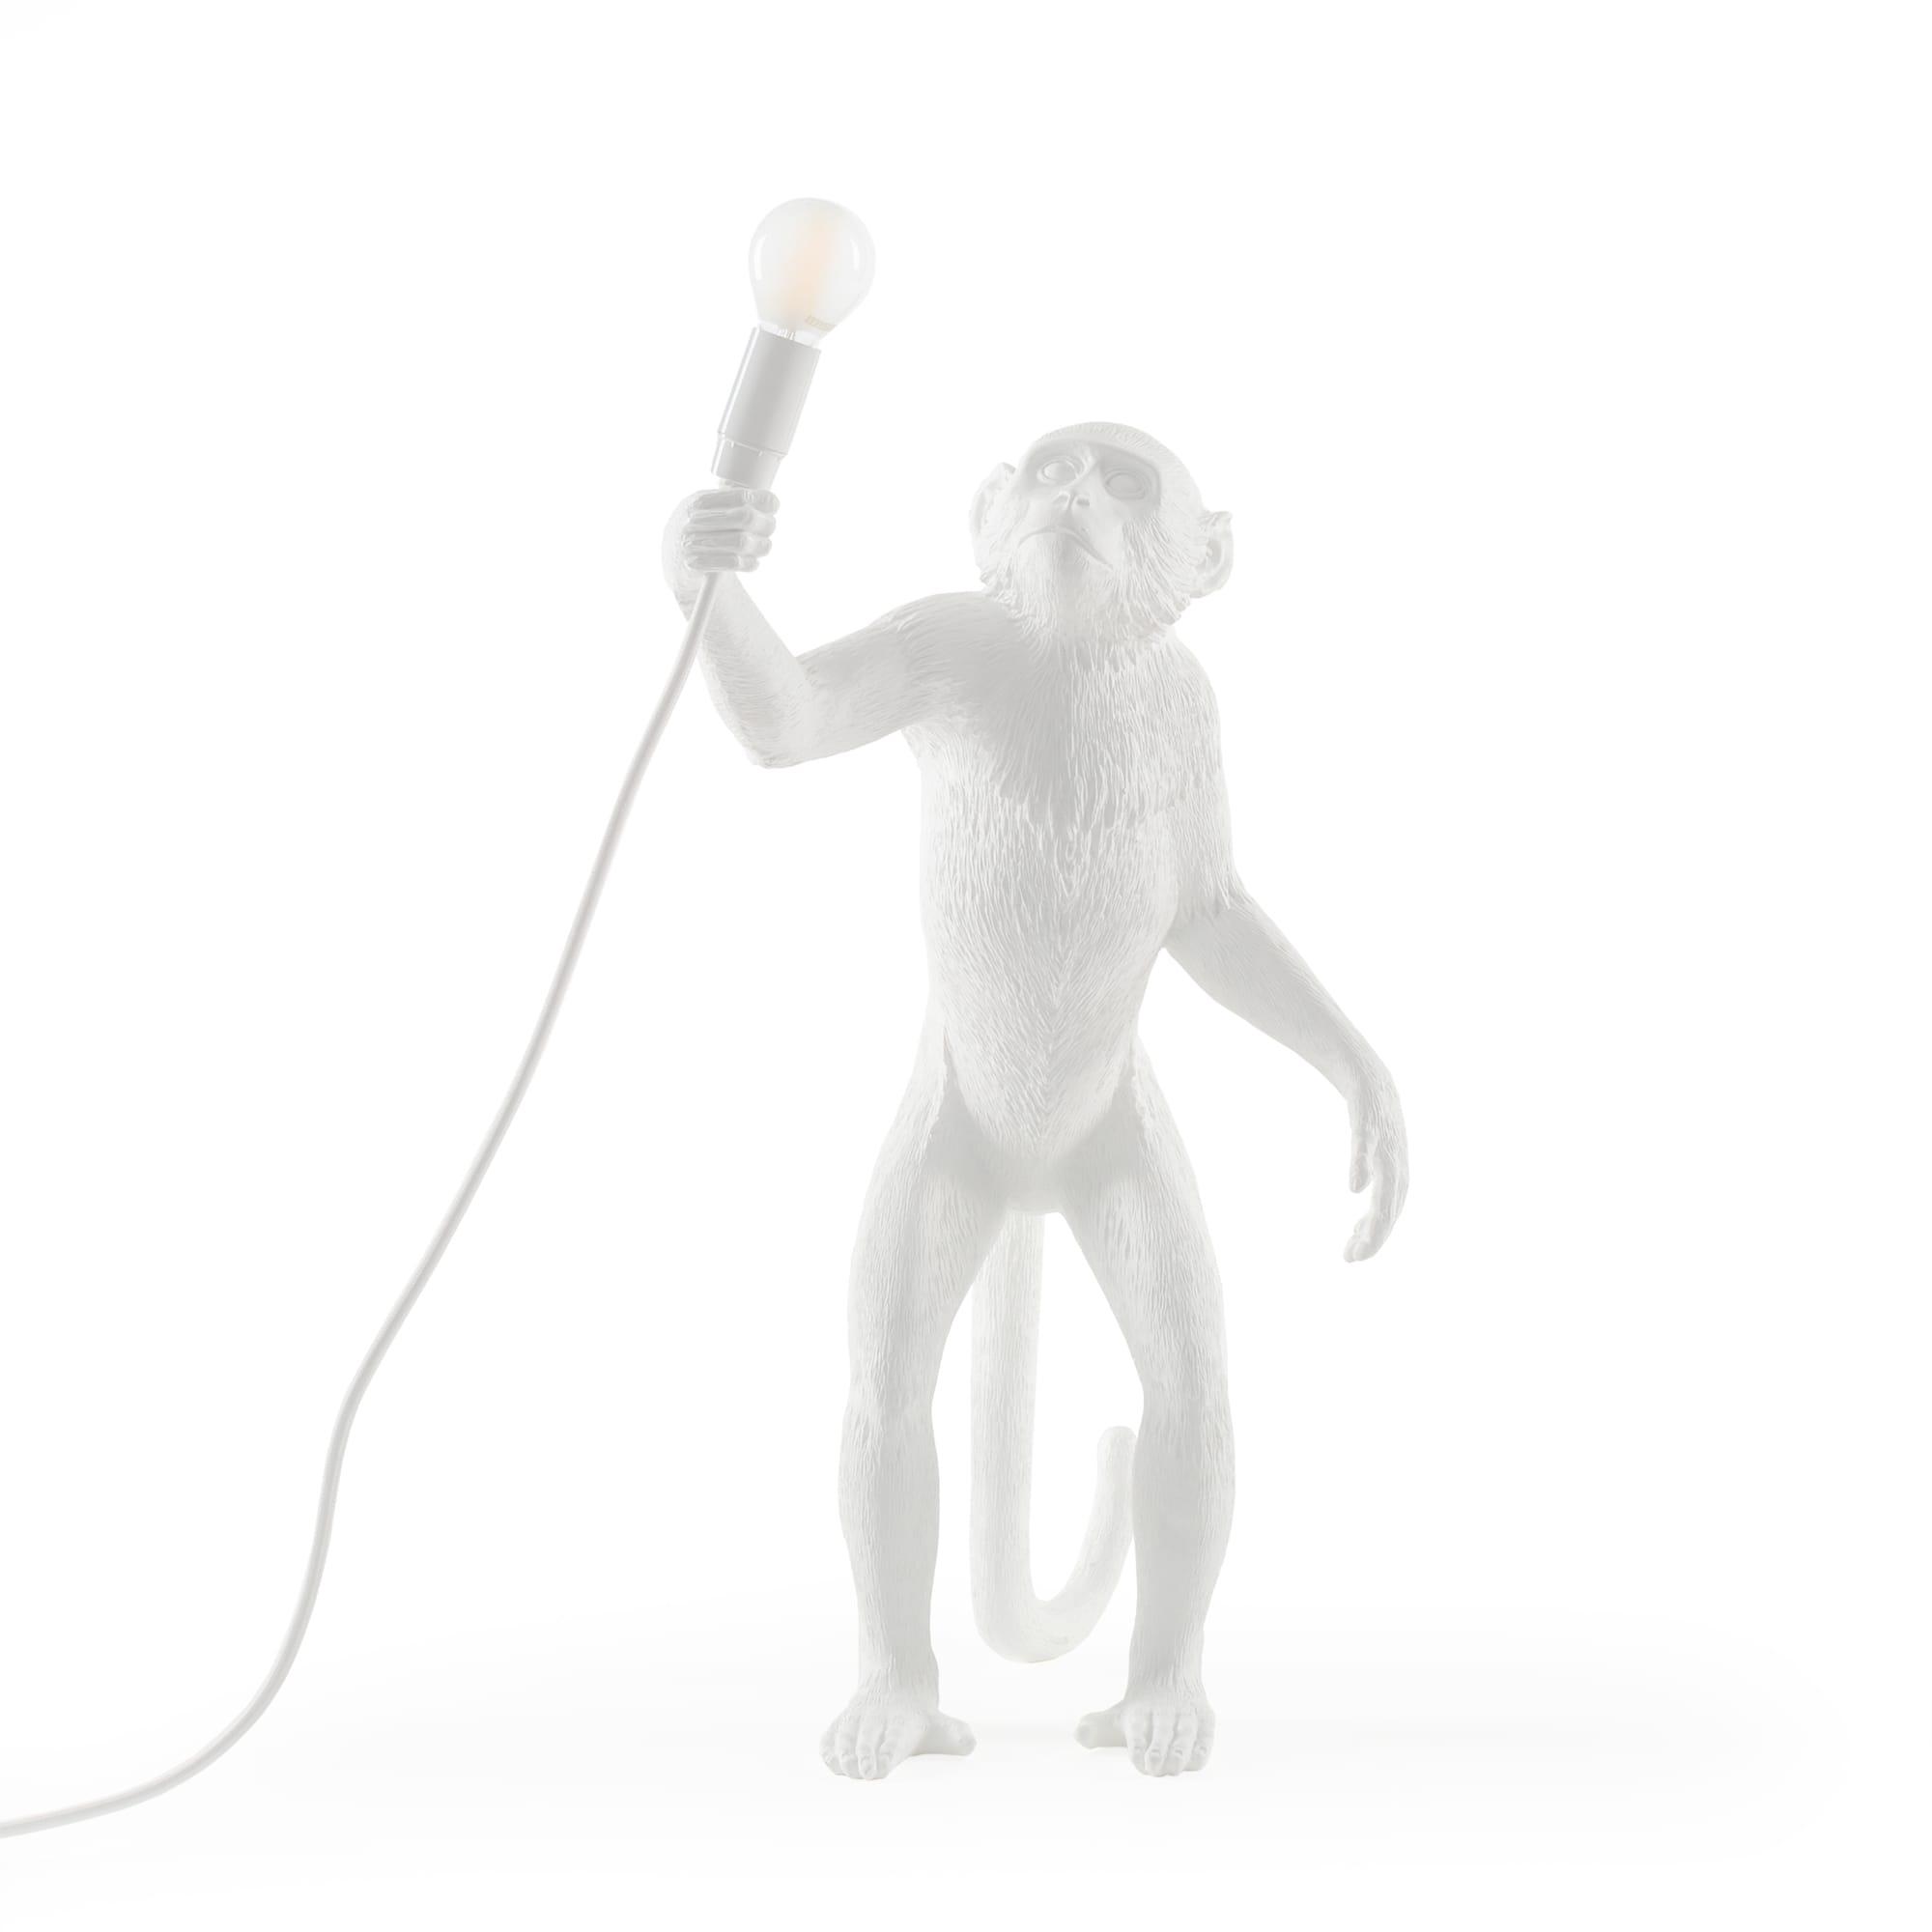 Full Size of Wohnzimmer Lampe Stehend Led Holz Ikea Klein Leuchte The Monkey Lamp Wei Seletti Hotel Ultra Lampen Esstisch Fototapeten Stehlampe Schlafzimmer Heizkörper Wohnzimmer Wohnzimmer Lampe Stehend